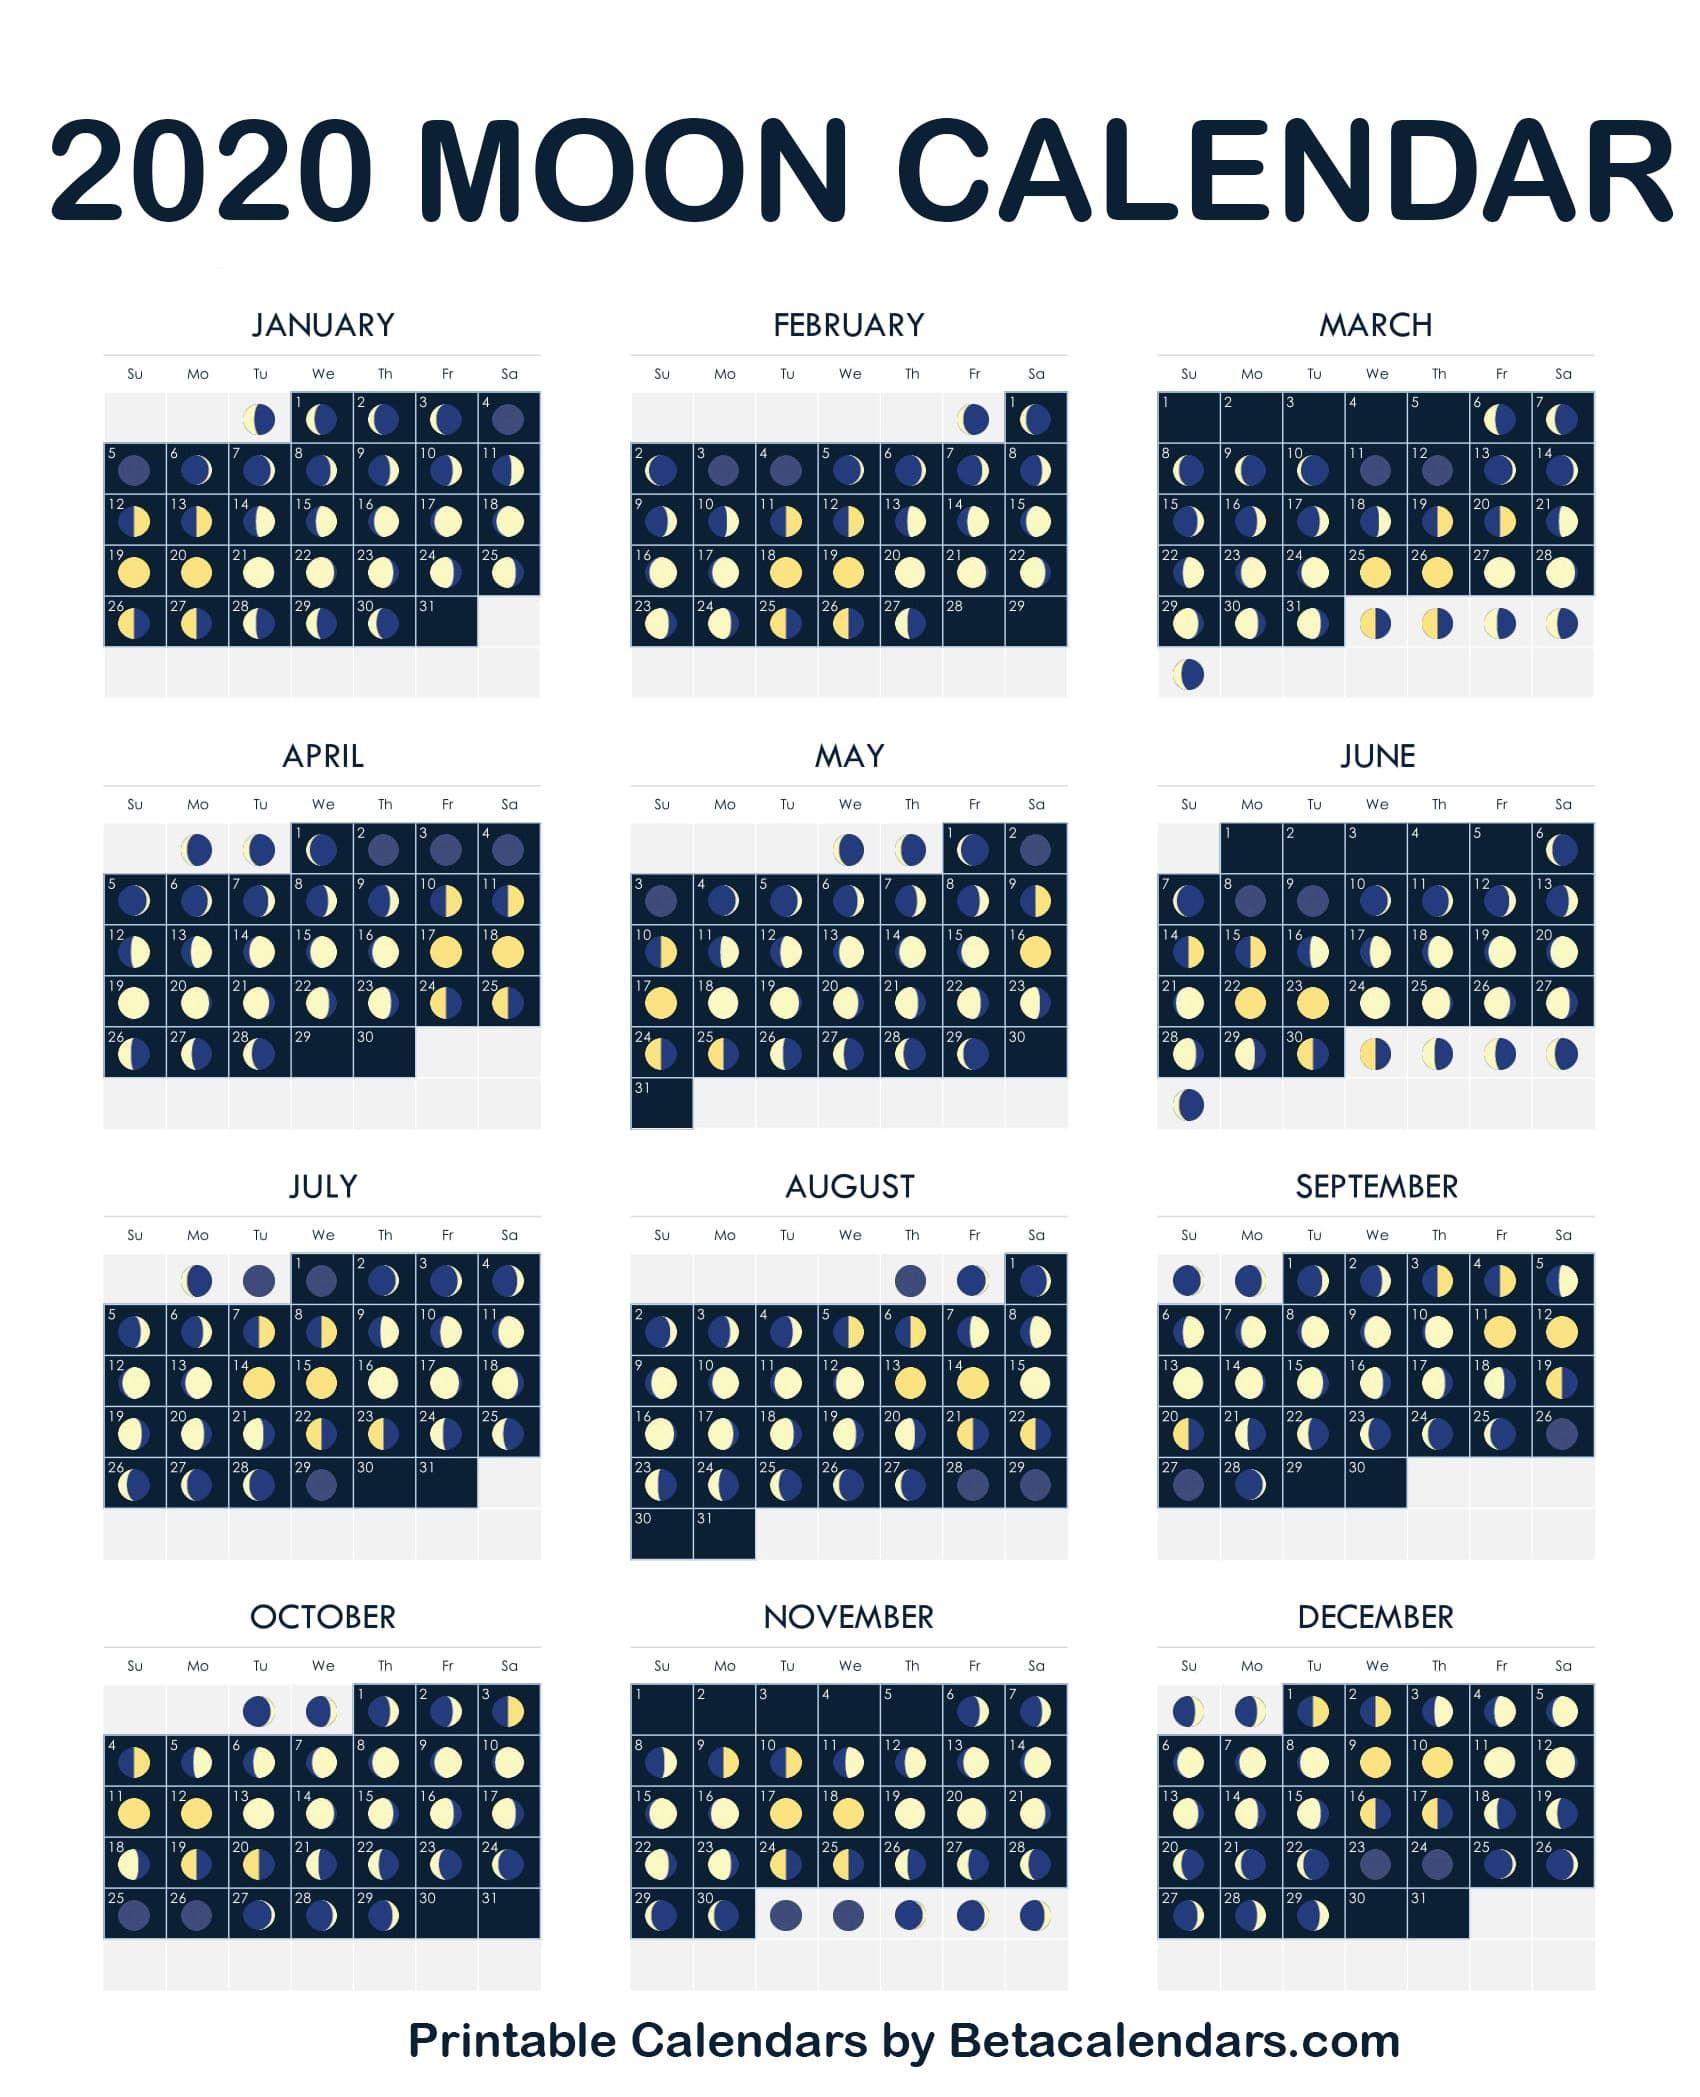 2020 Moon Calendar | October Calendar, Moon Calendar, Moon